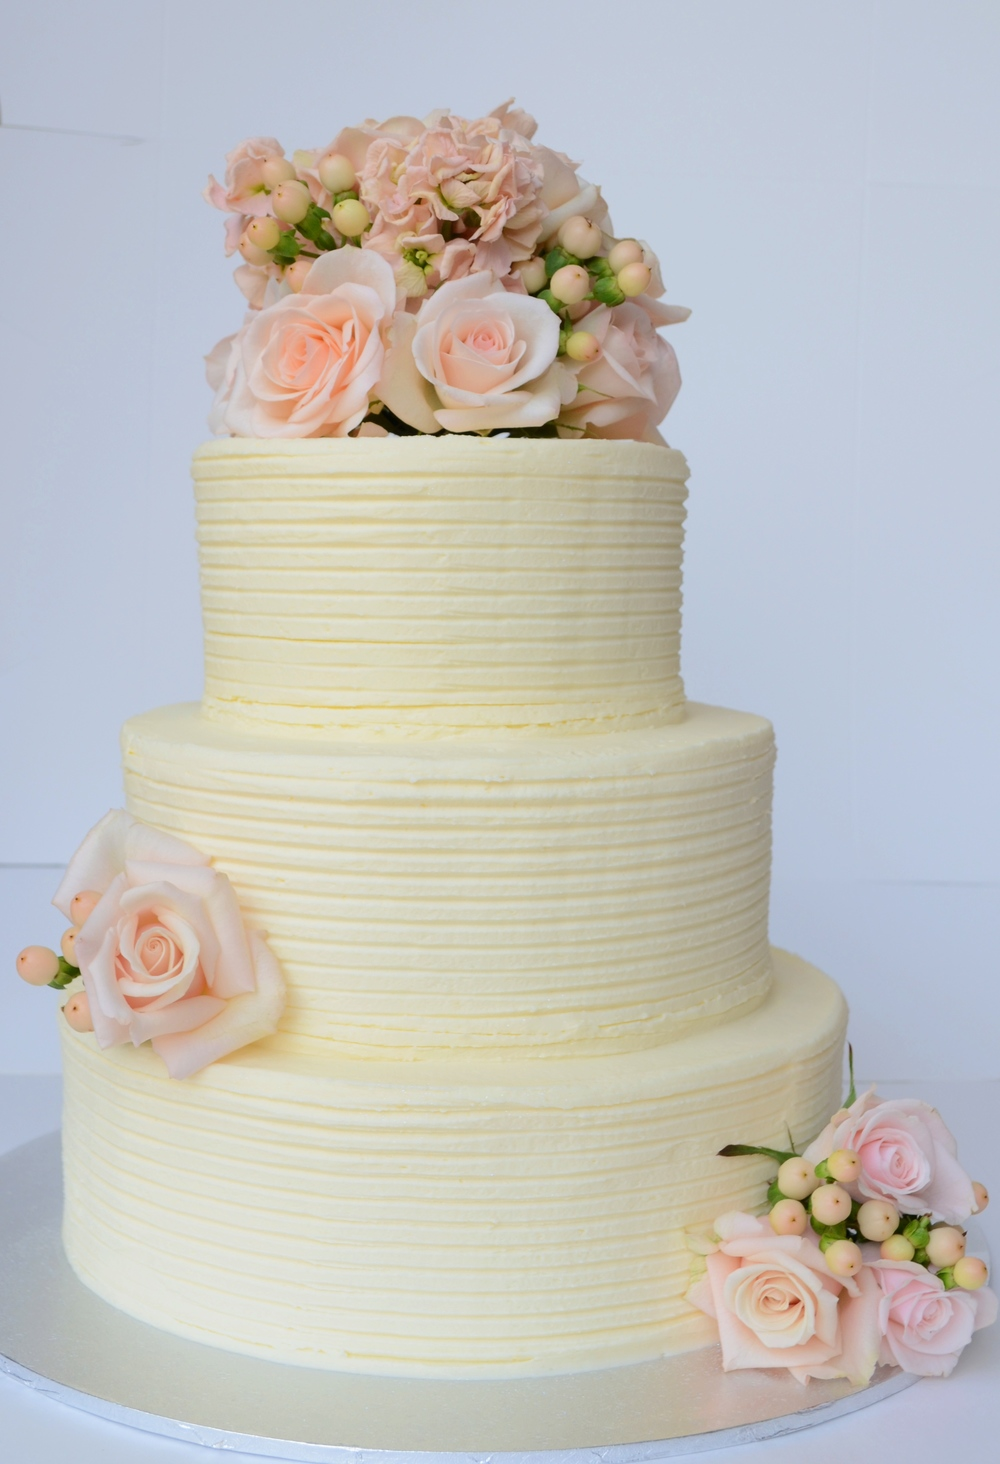 Vanilla Pod Frosted Wedding Cake. White chocolate mud with lemon mousse cake with textured scrape finish and fresh flowers.JPG